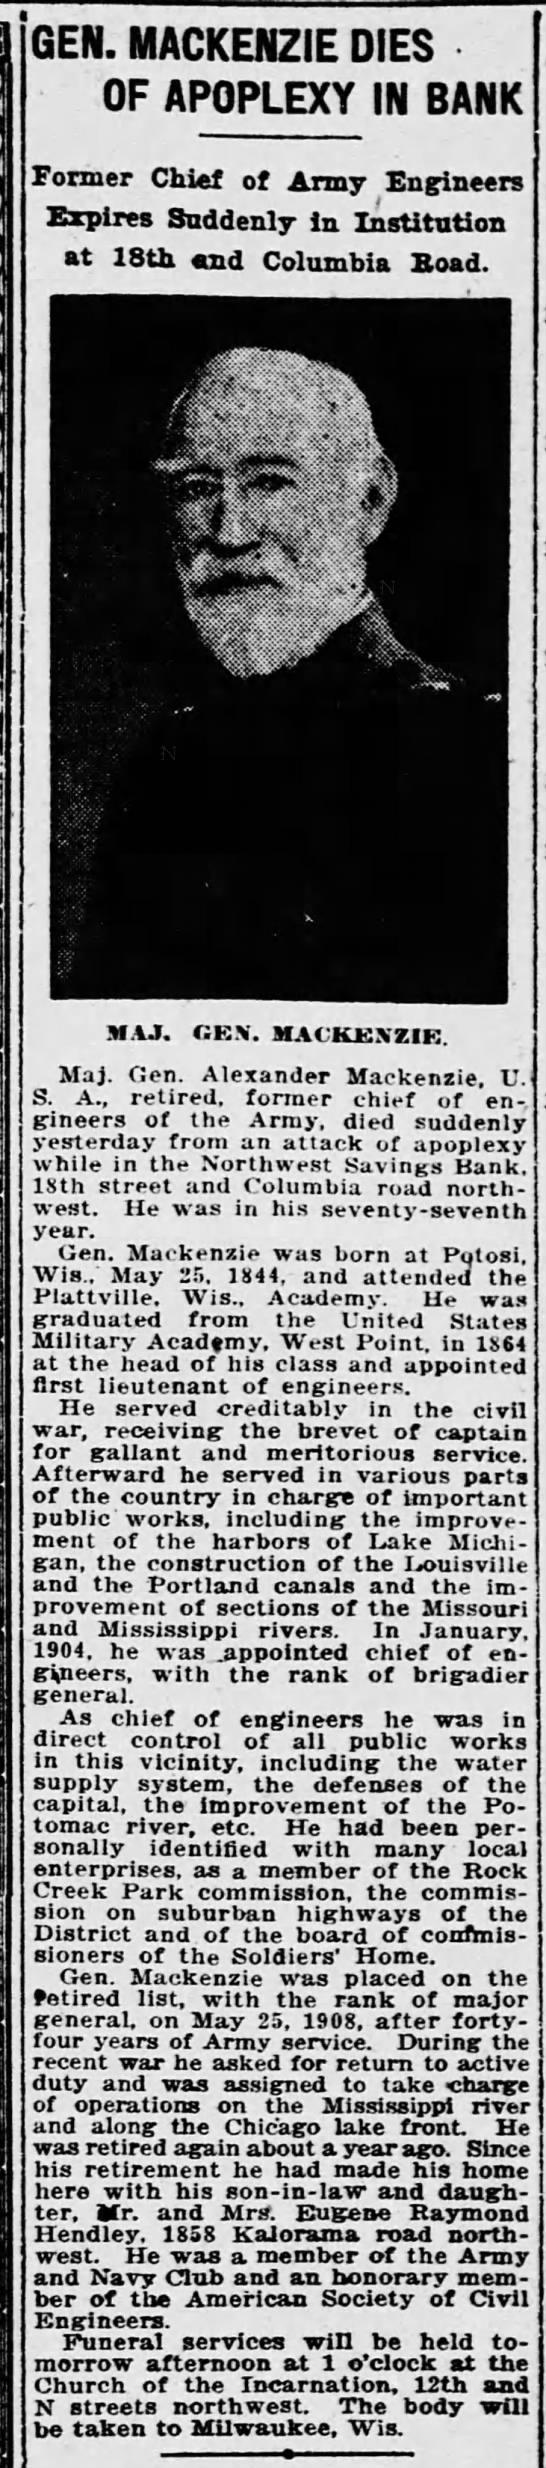 Alexander Mackenzie (1844-1921) -